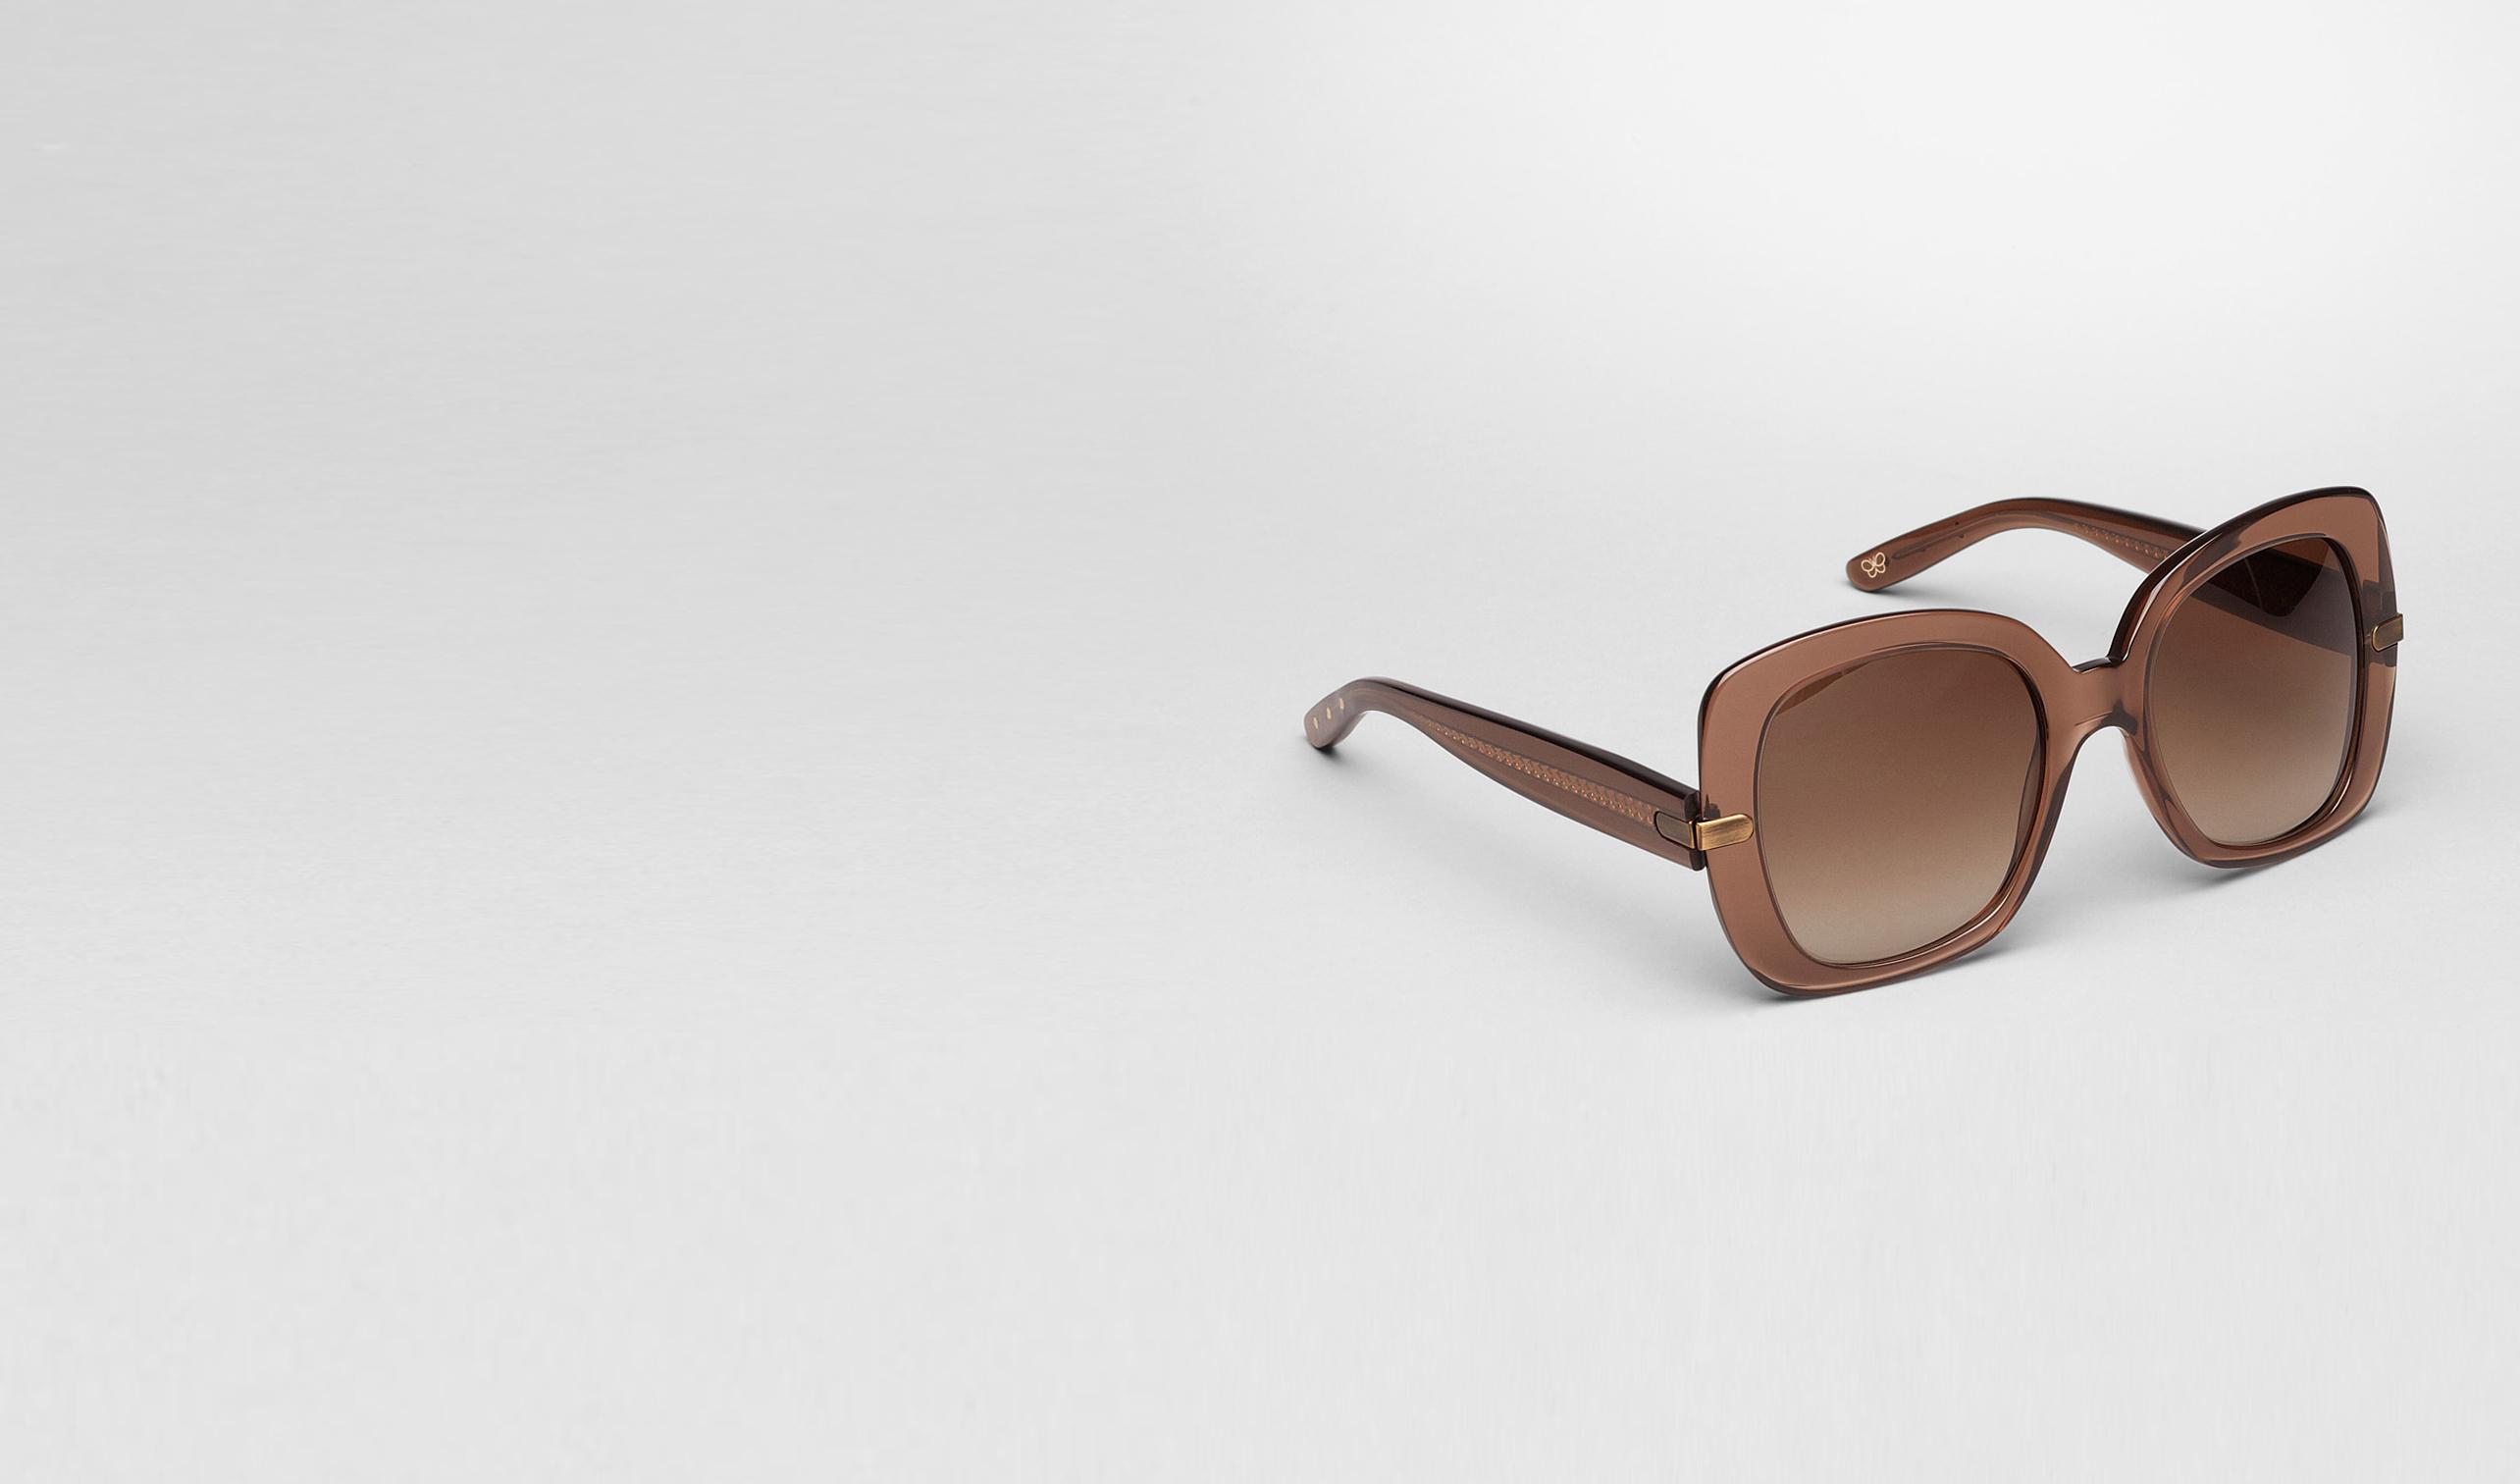 BOTTEGA VENETA Sunglasses D Acetate Eyewear BV 229/S pl